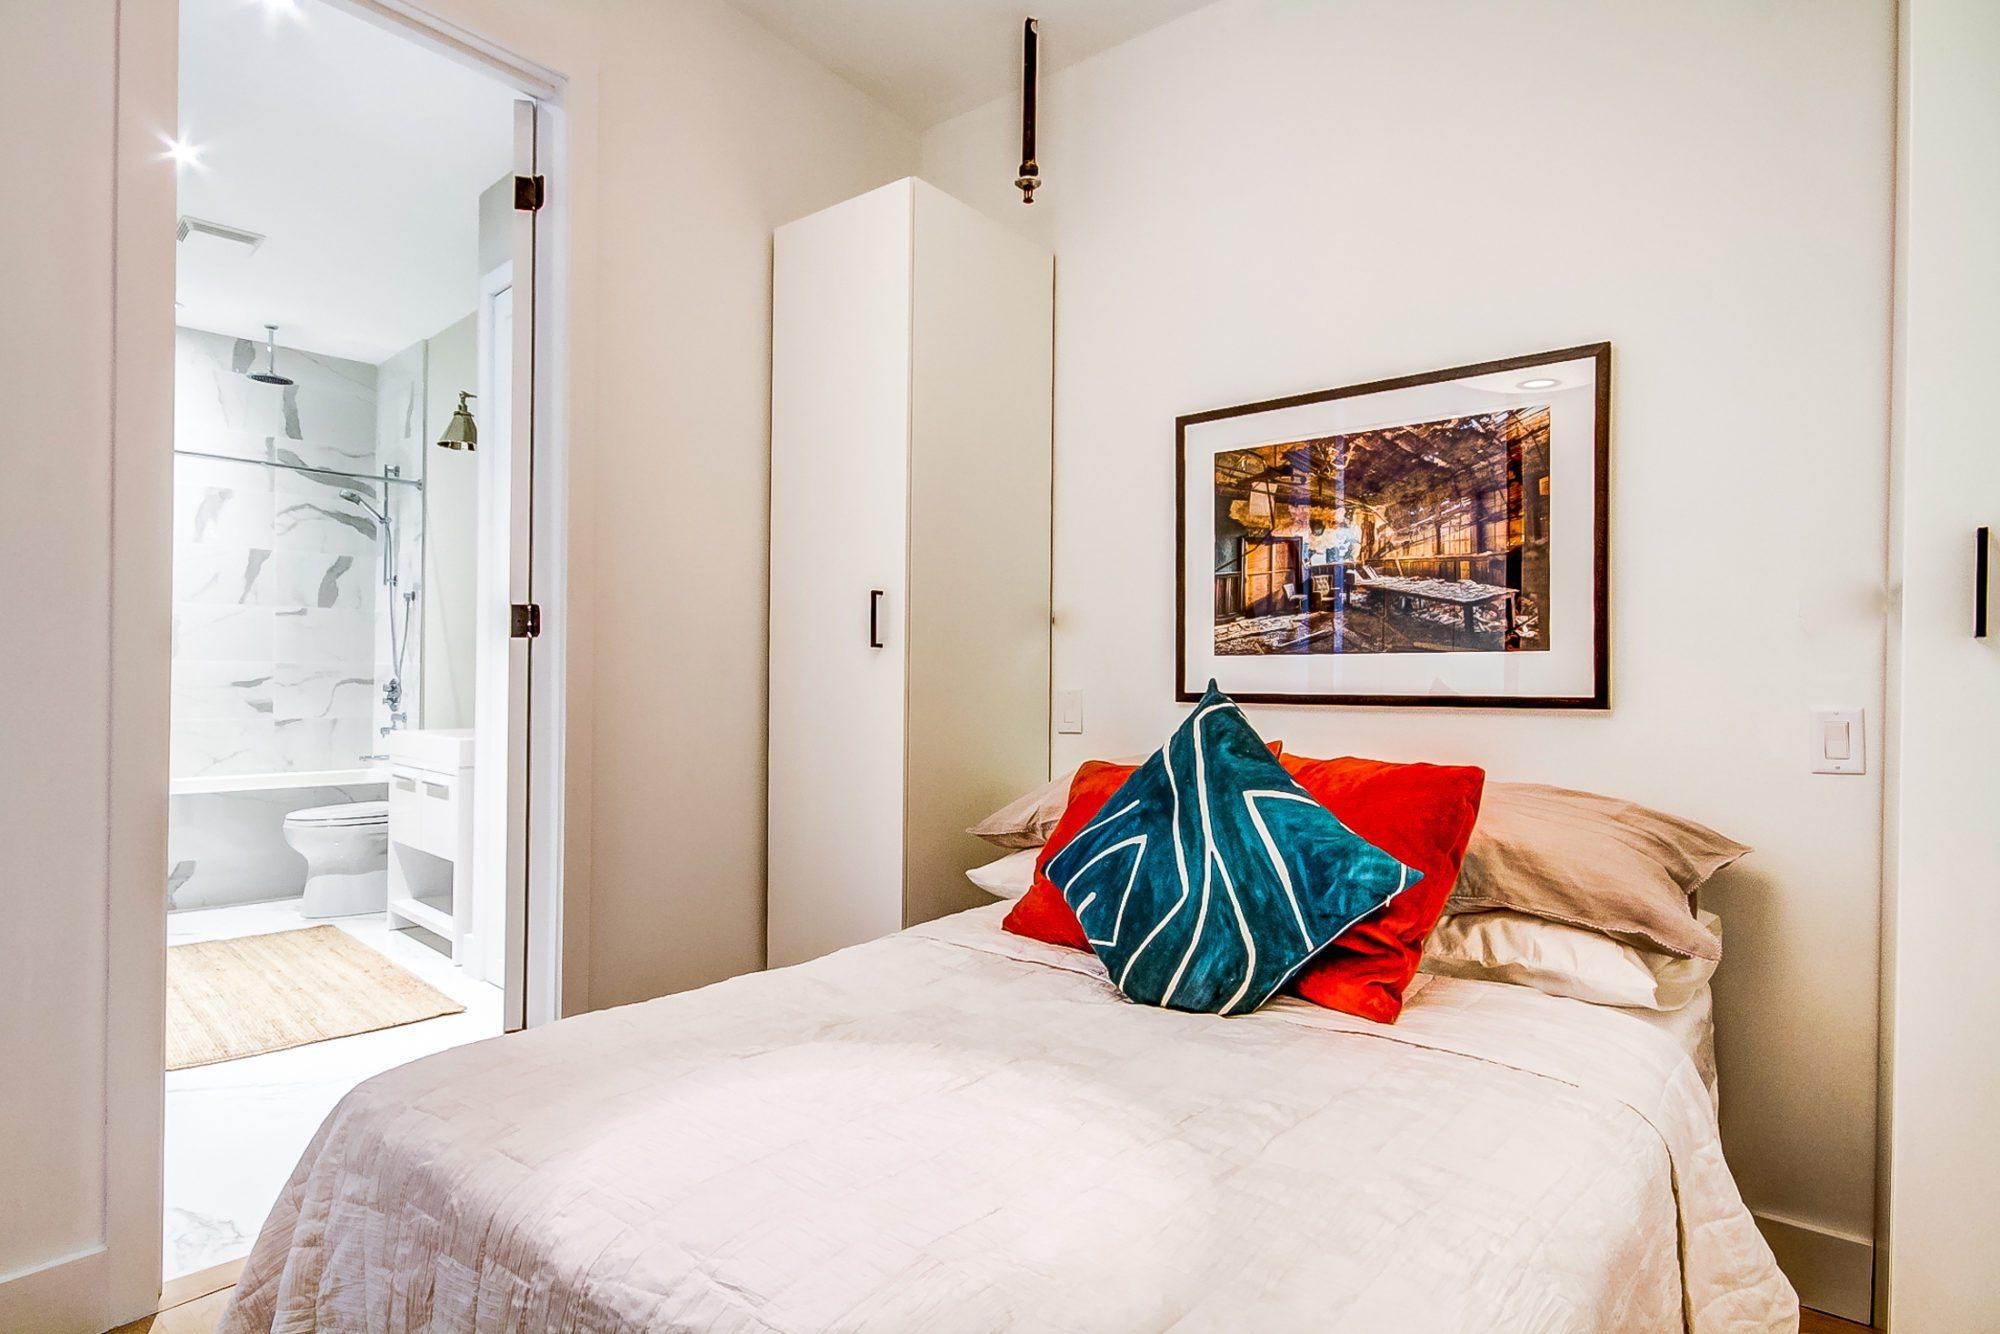 toronto-apartment-for-rent-90-sumach-street-6